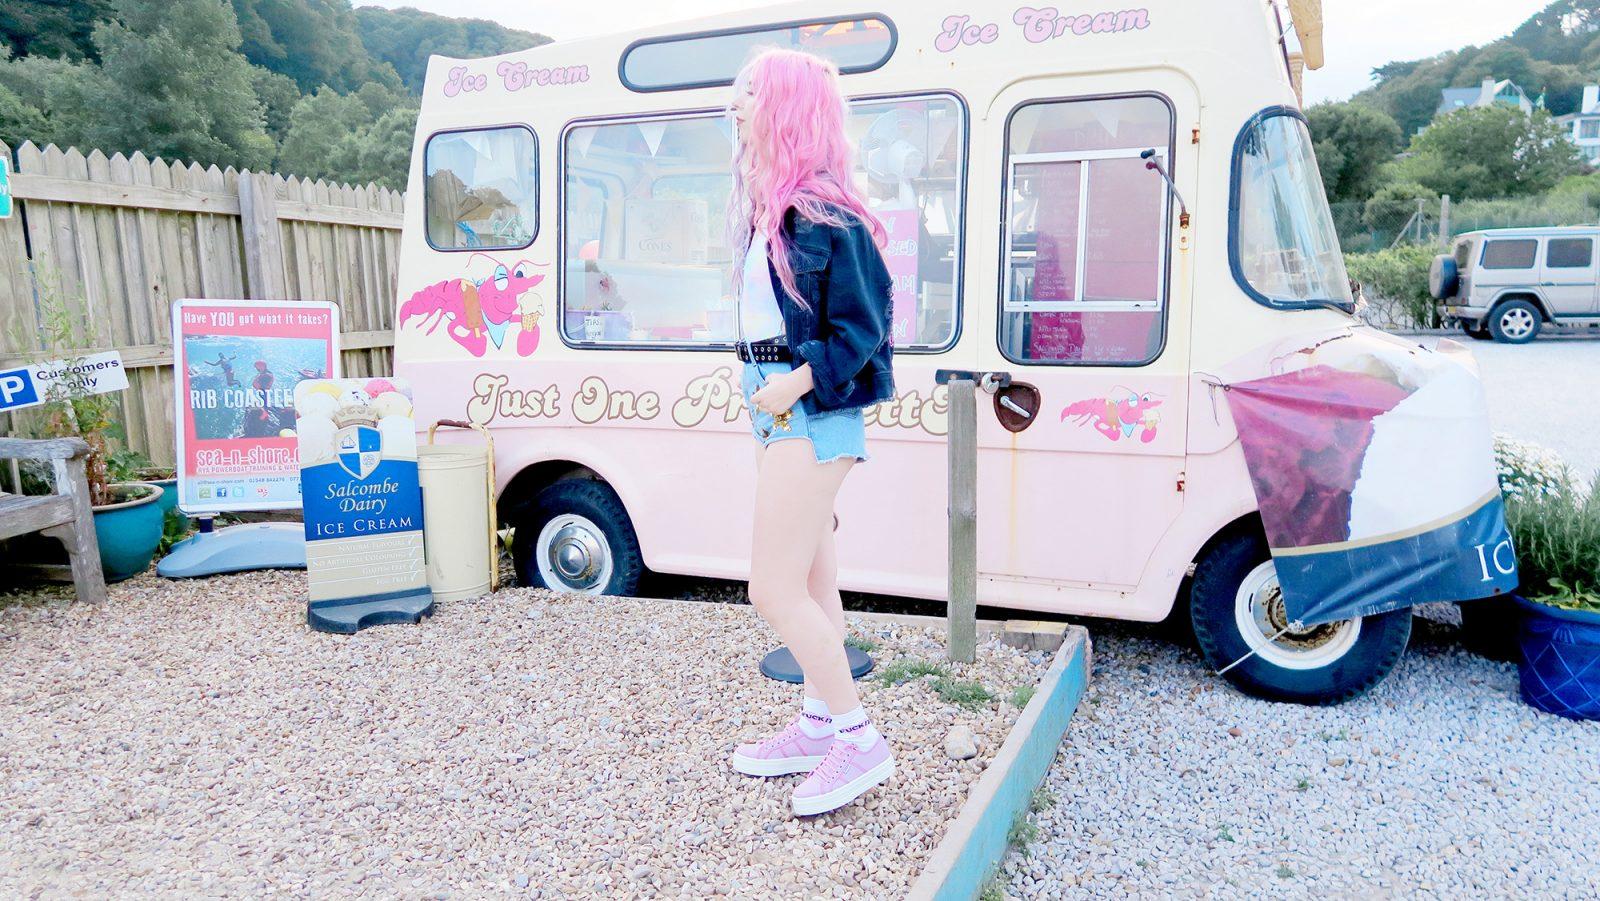 Vintage Icecream Van, Boohoo denim shorts, platform trainers, sequin shorts, pastel swimsuit